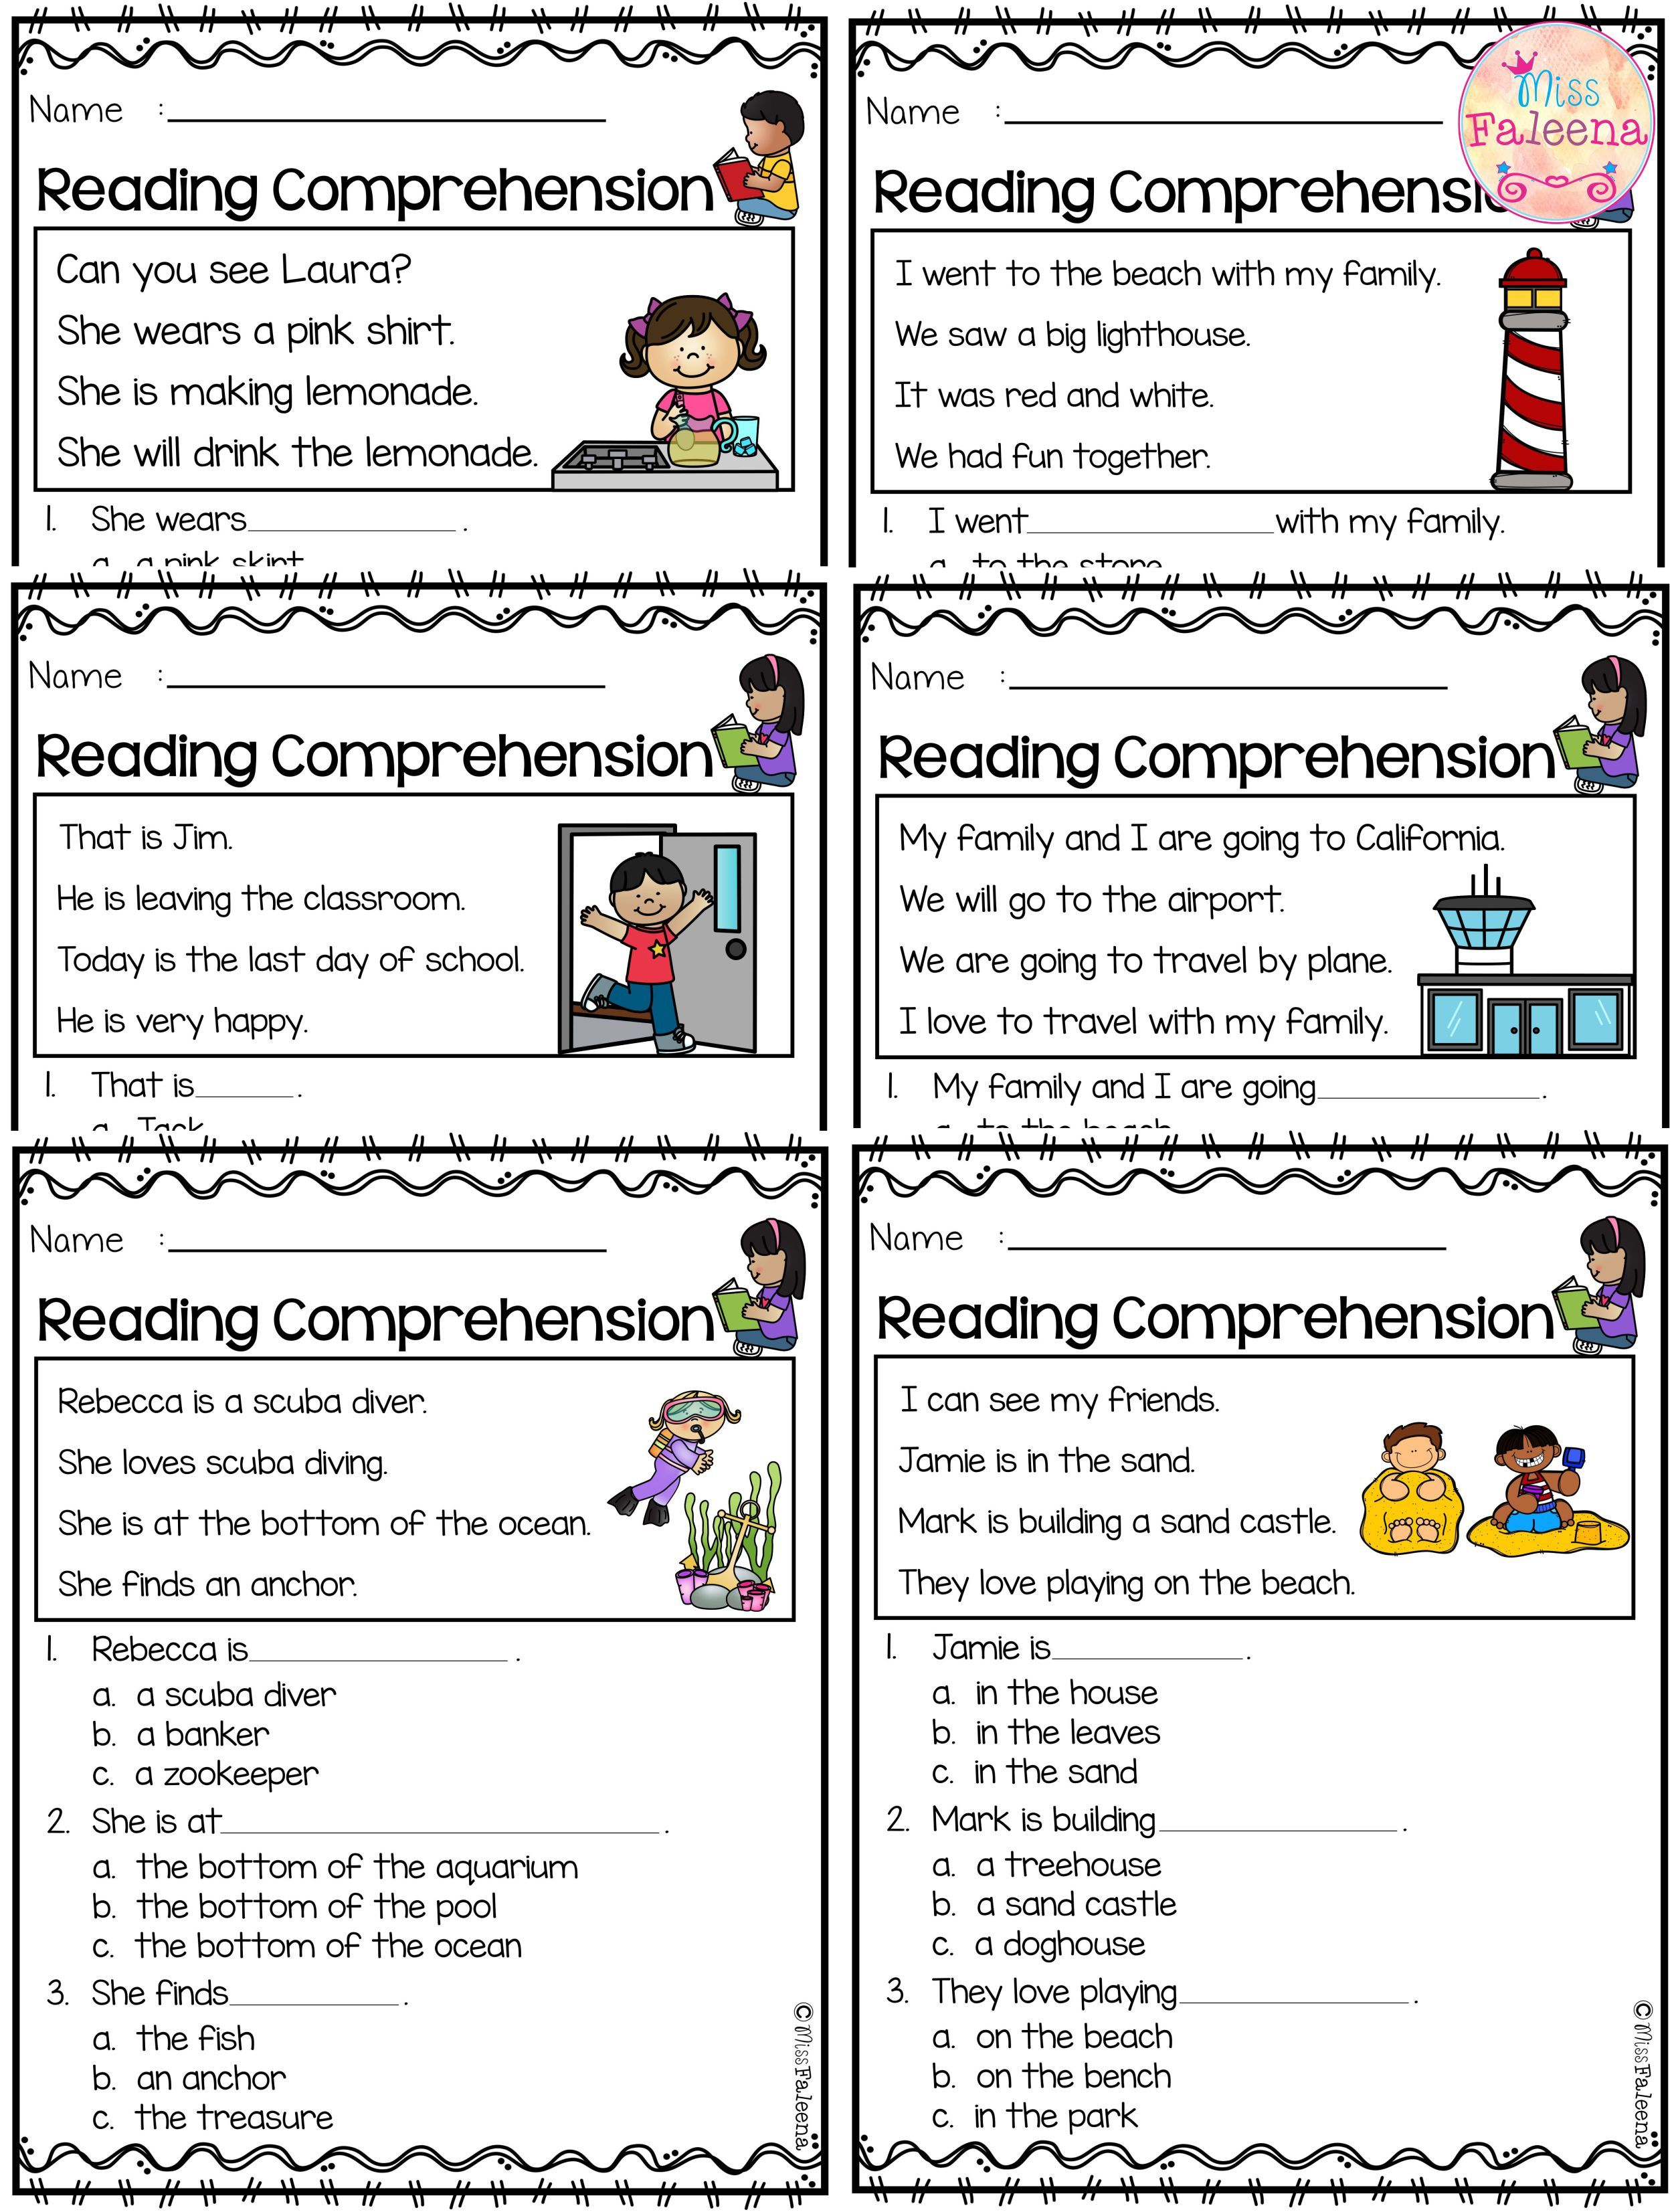 June Reading Comprehension Is Suitable For Kindergarten Students Or Beginning Readers Thi Reading Comprehension Comprehension Reading Comprehension Worksheets